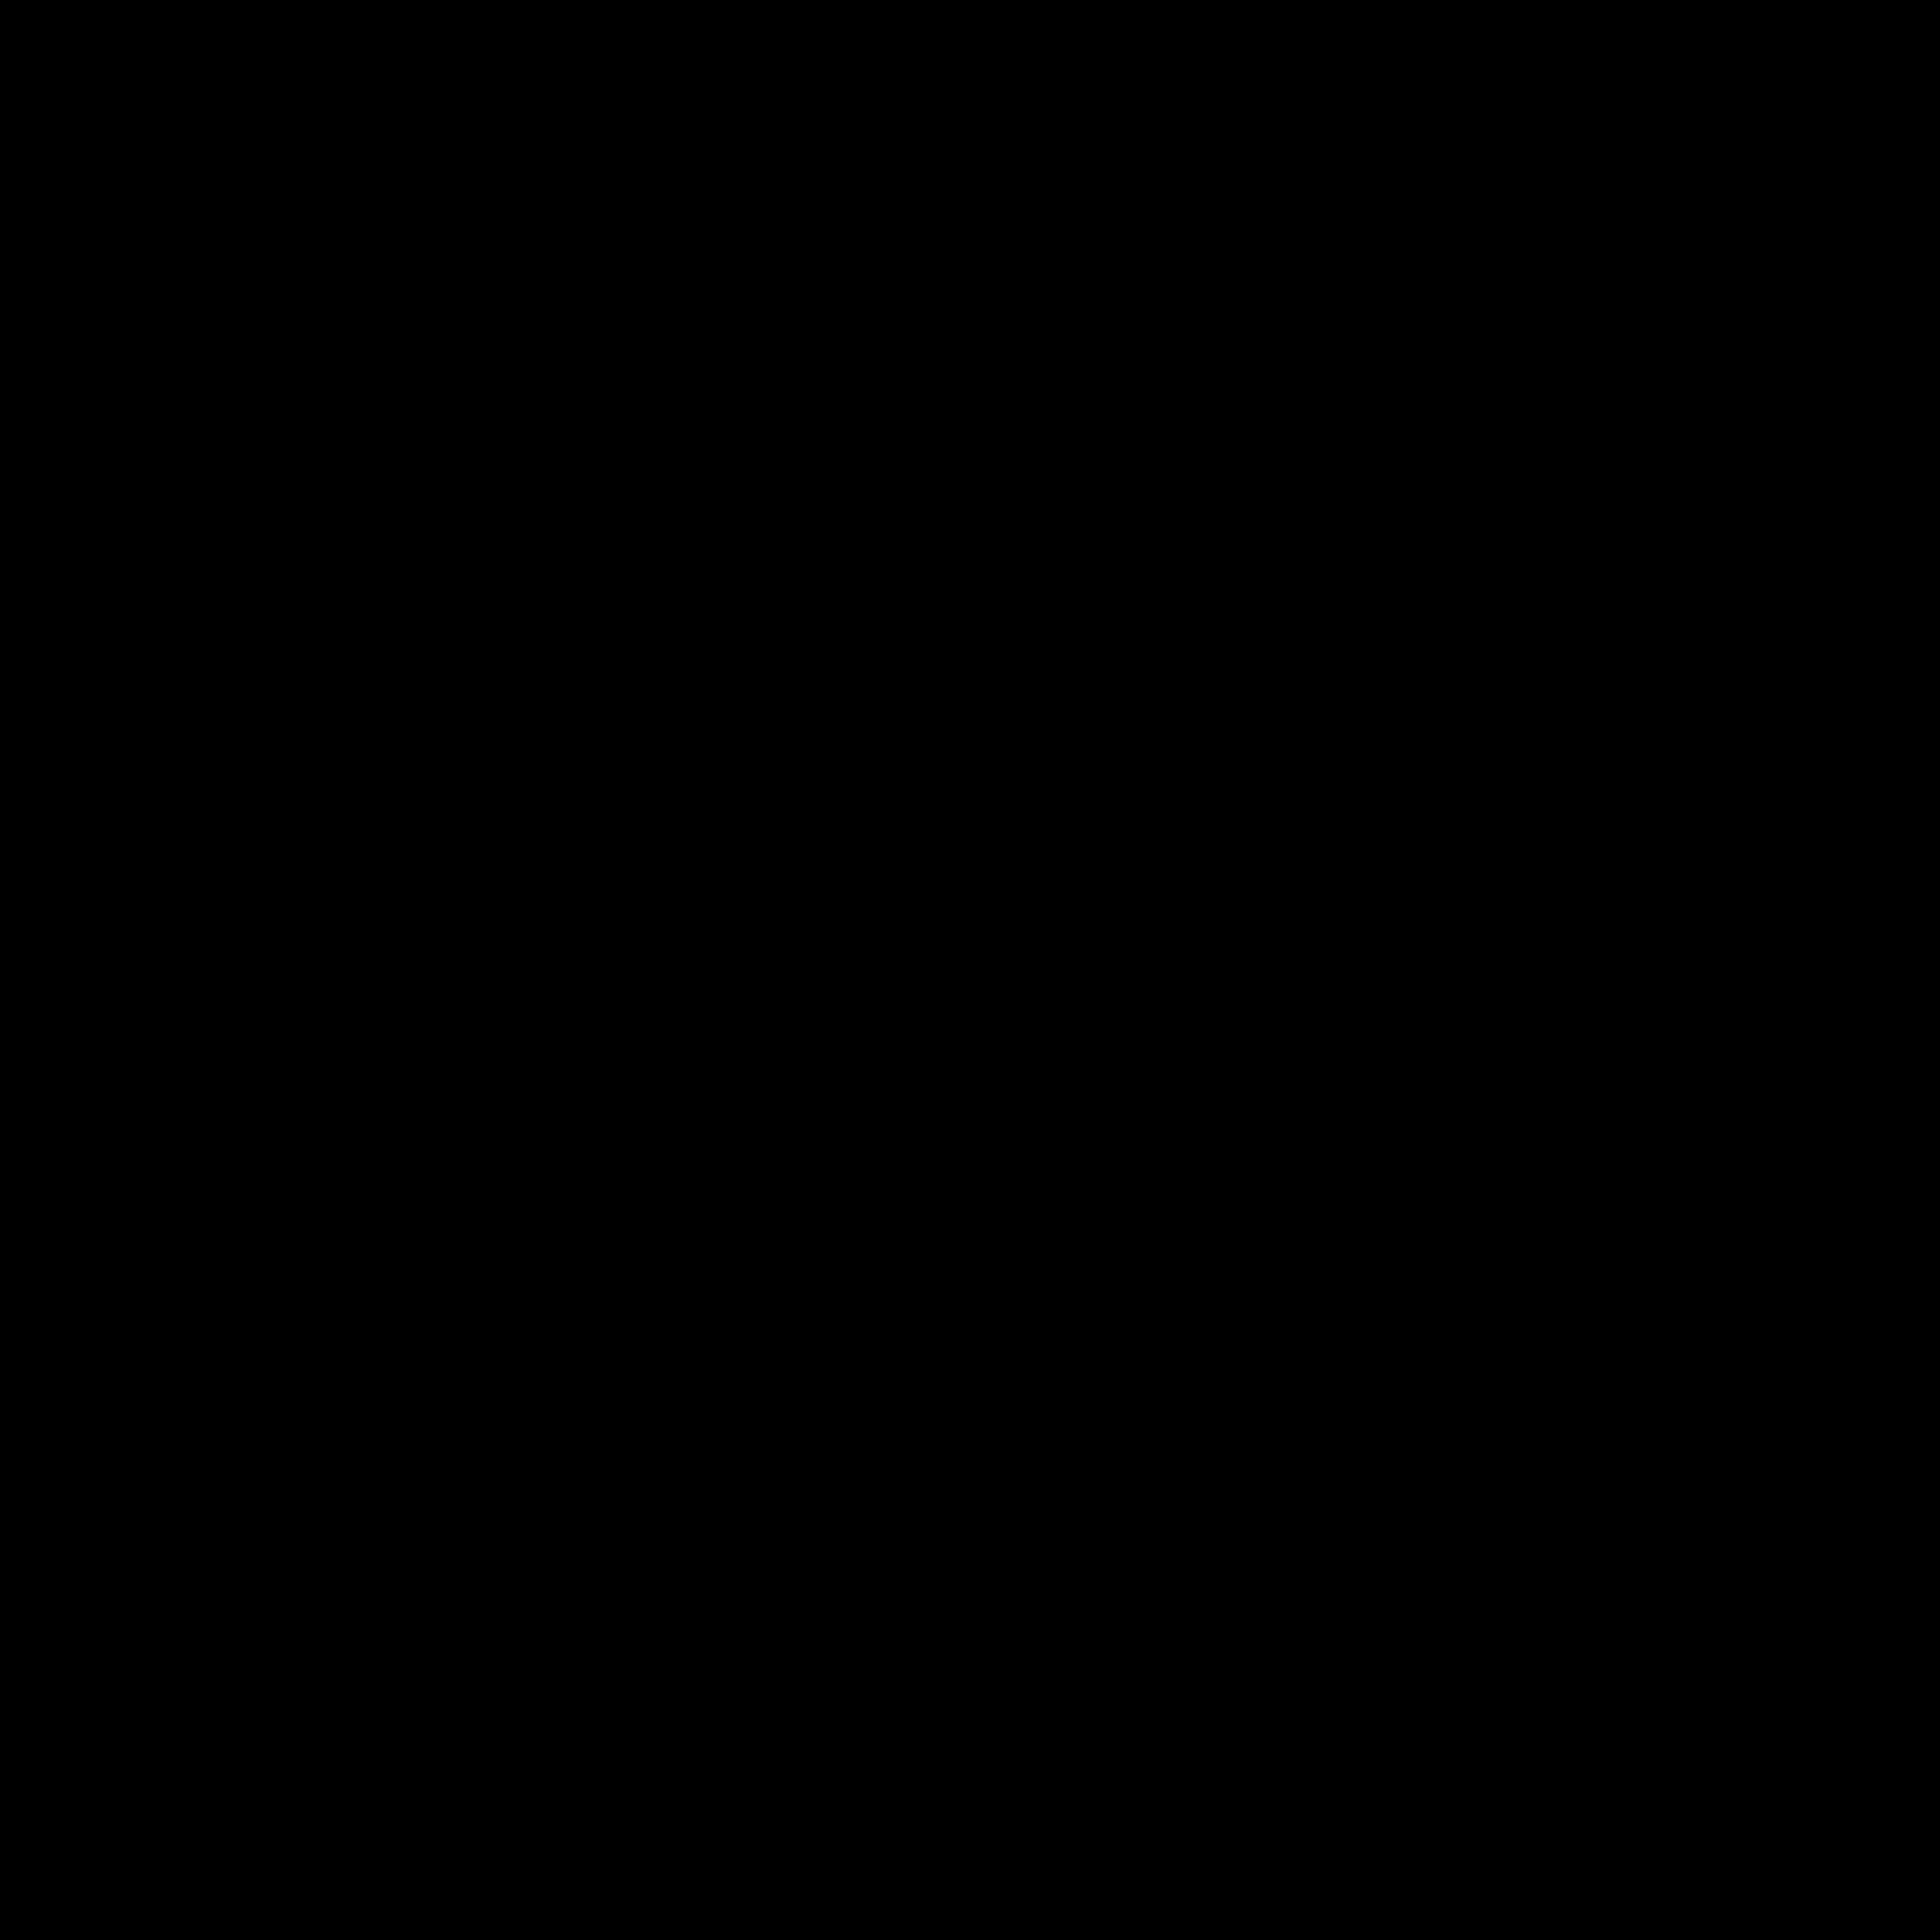 All HPS Logos-07.png